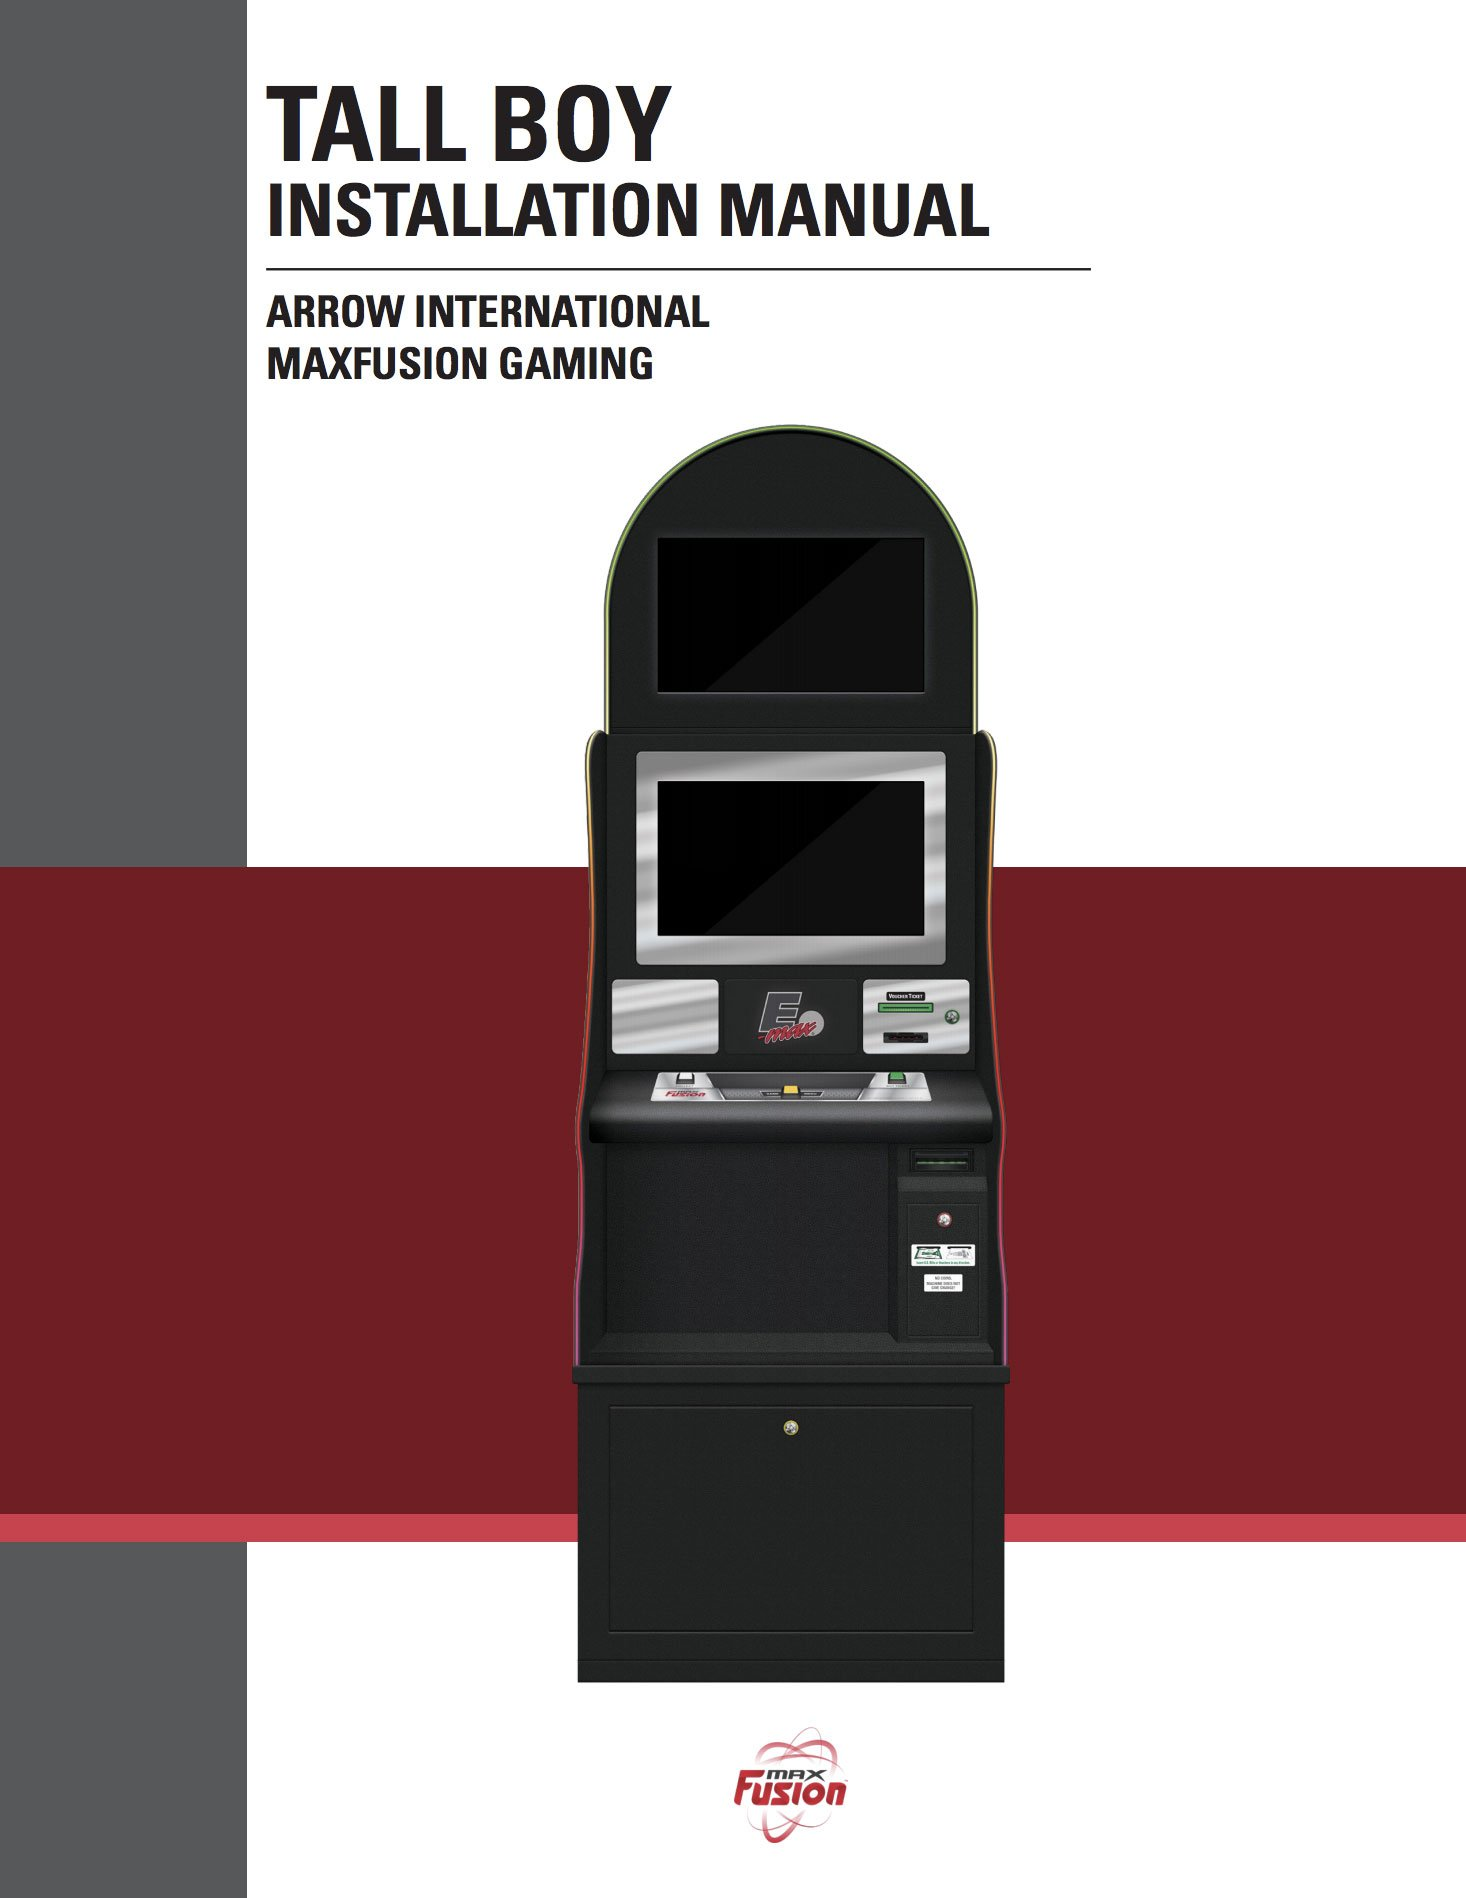 MaxFusion TallBoy Manual Equipment Manuals